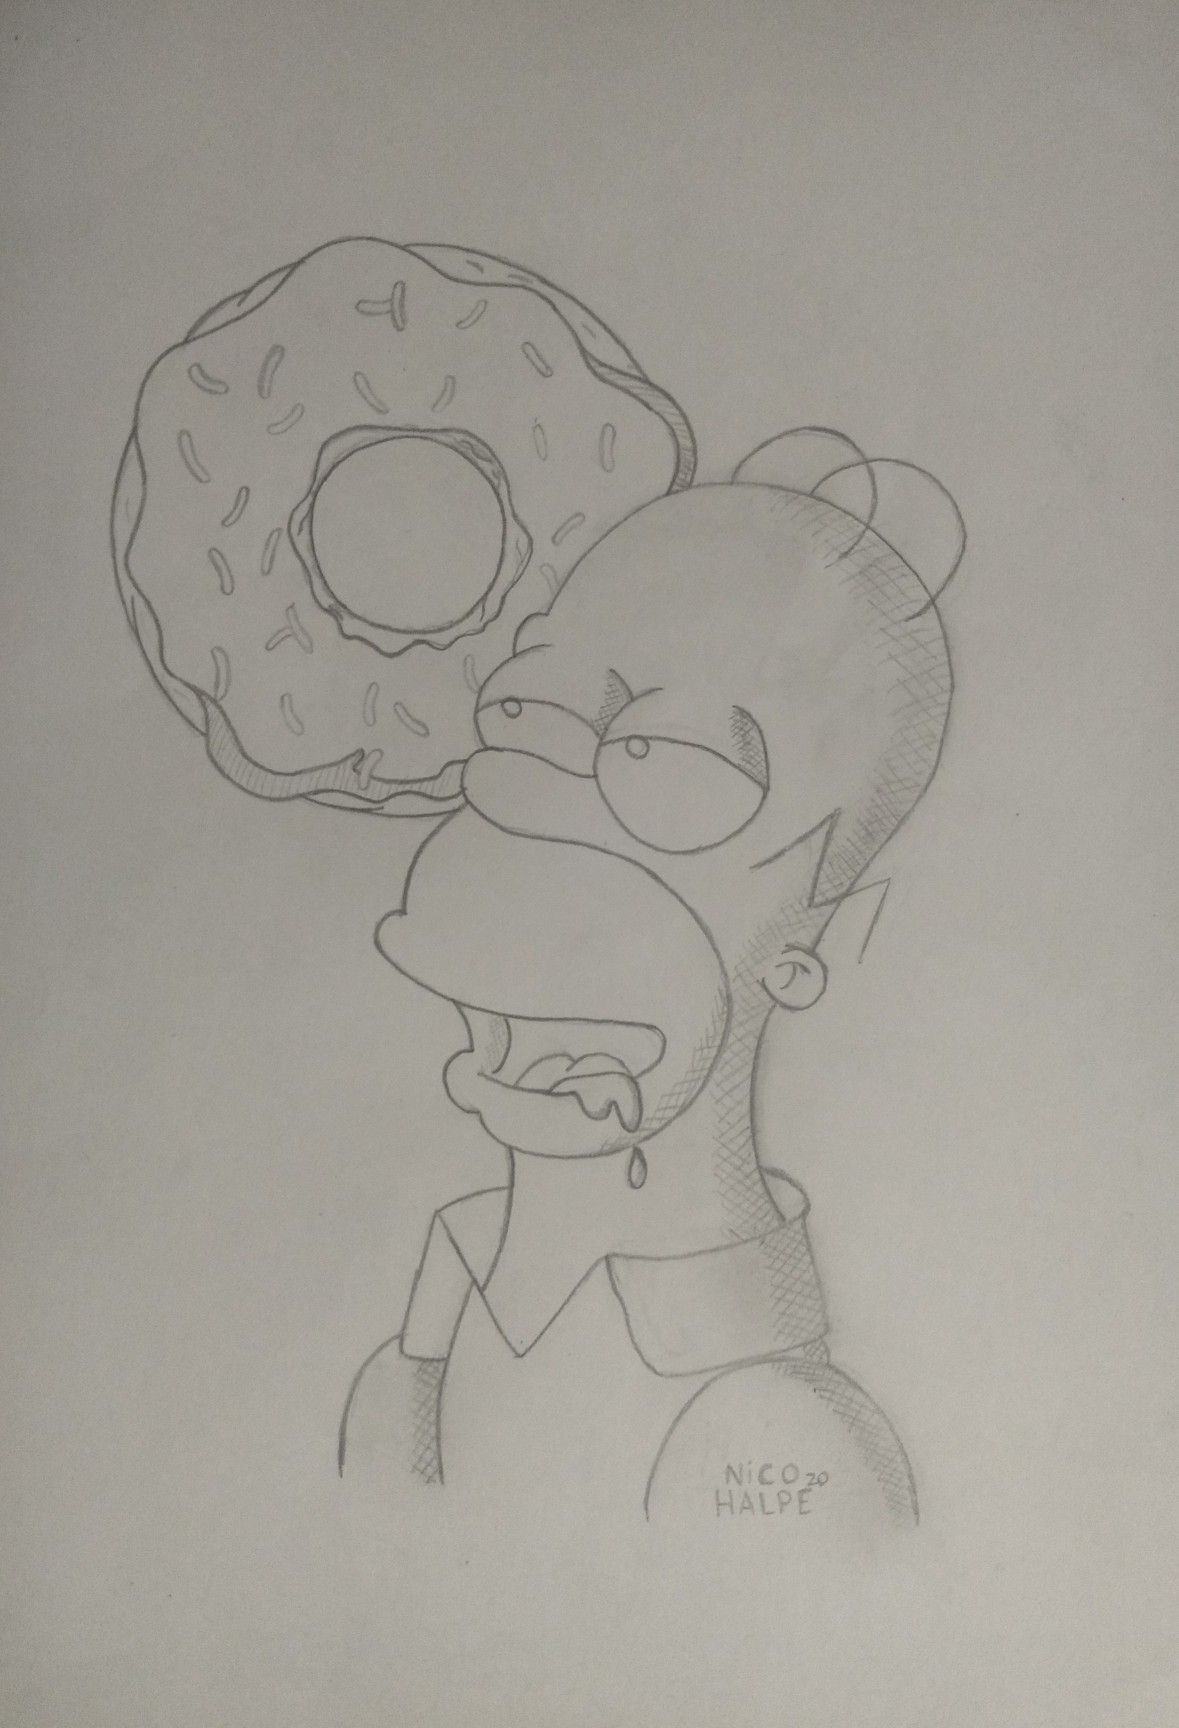 Homero Simpson In 2020 Disney Art Drawings Art Drawings Sketches Pencil Drawings